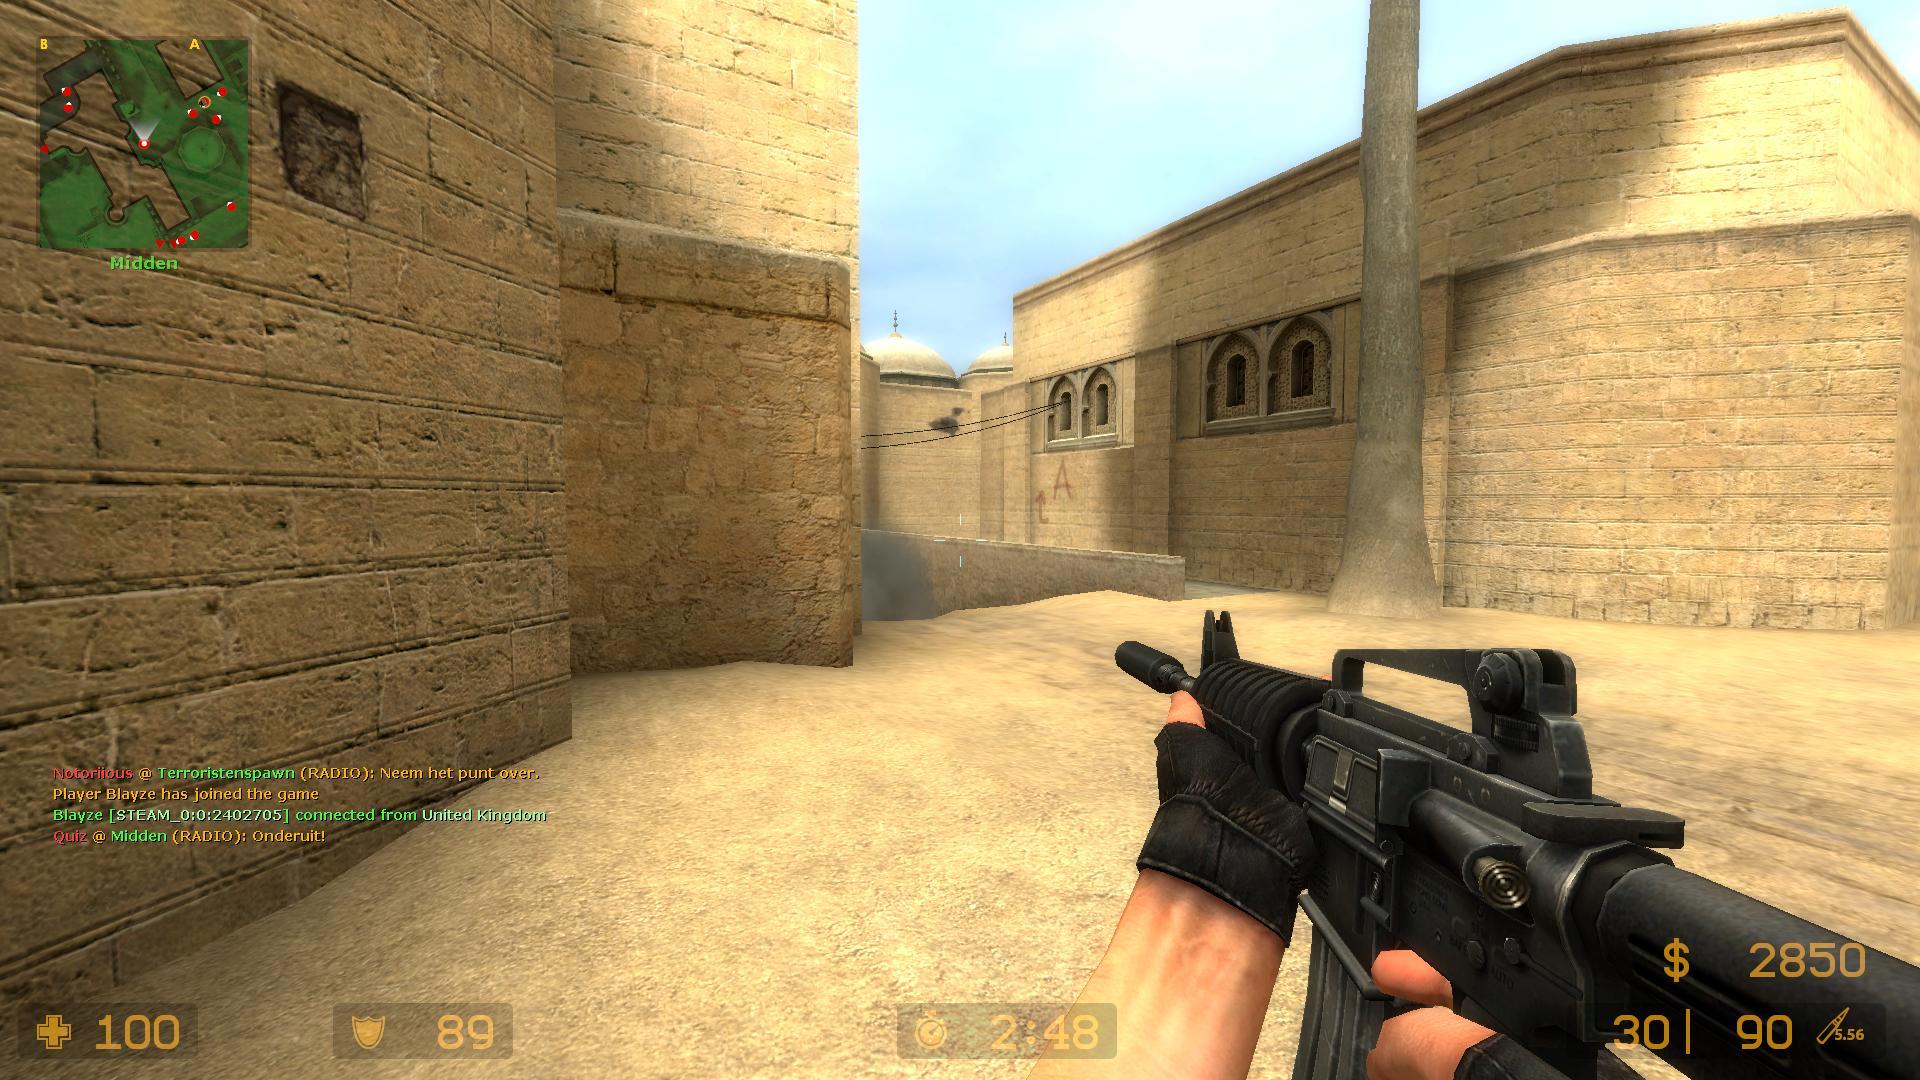 Counter strike Source css screenshot - Gamingcfg.com Сега Приколы